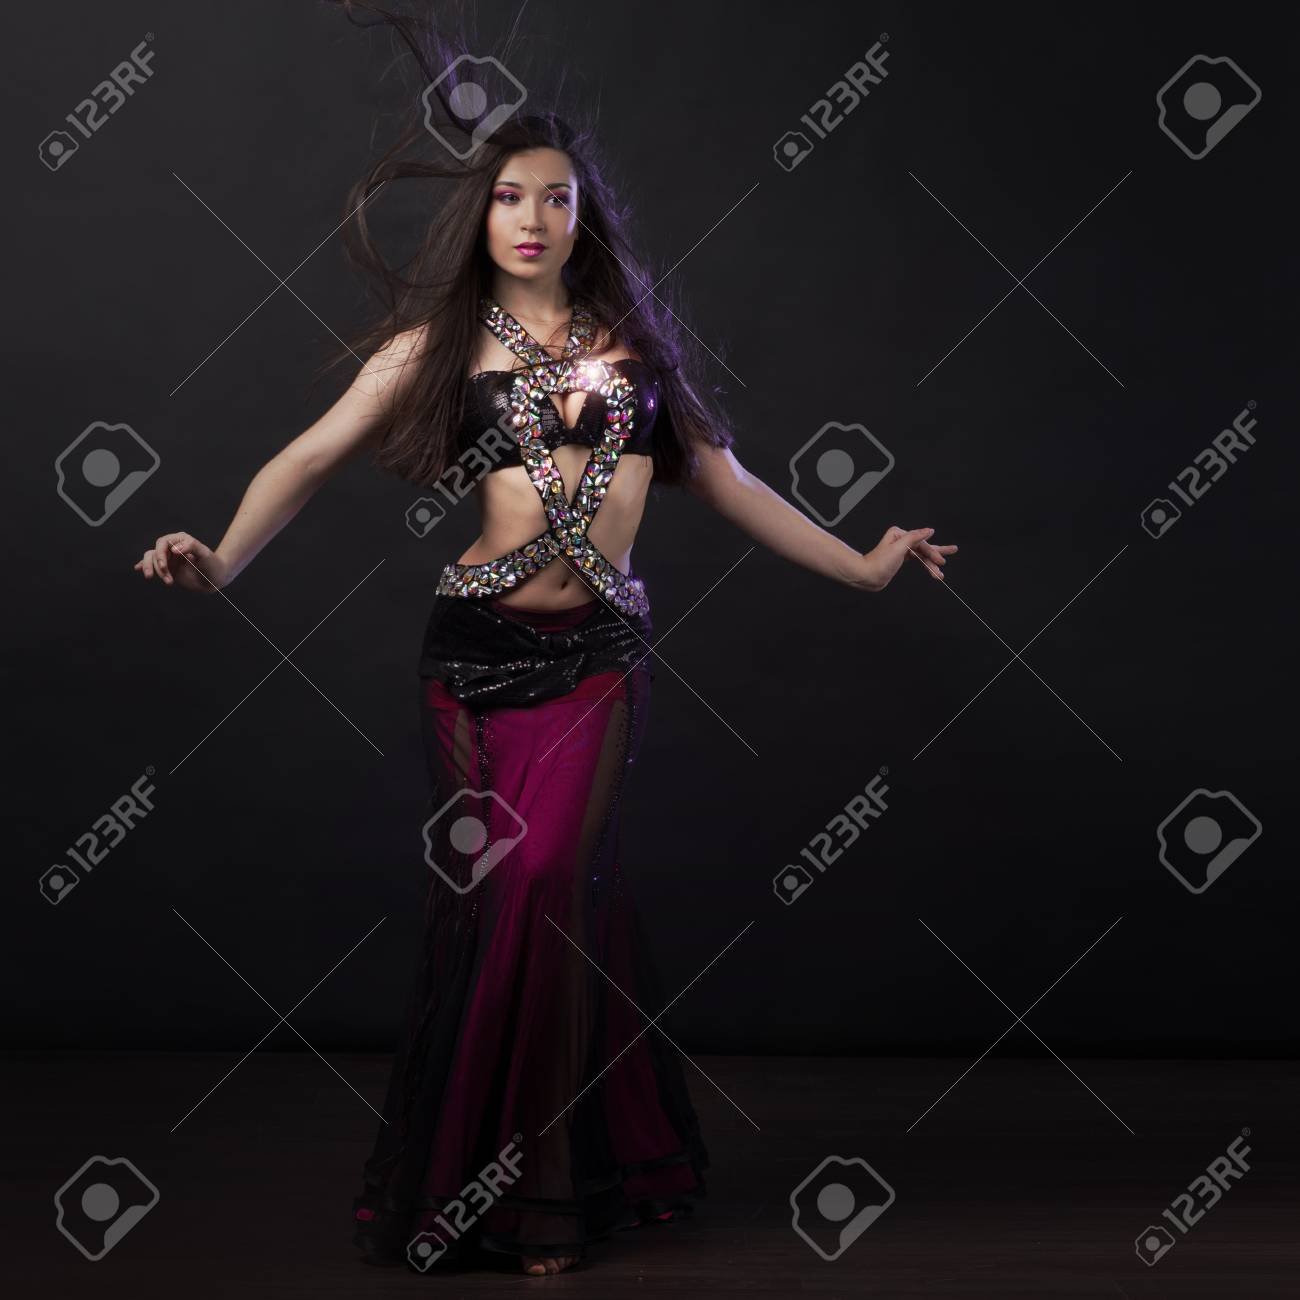 d2869fc39fa Beautiful girl in crimson dress dancing Oriental dance Stock Photo -  92557783